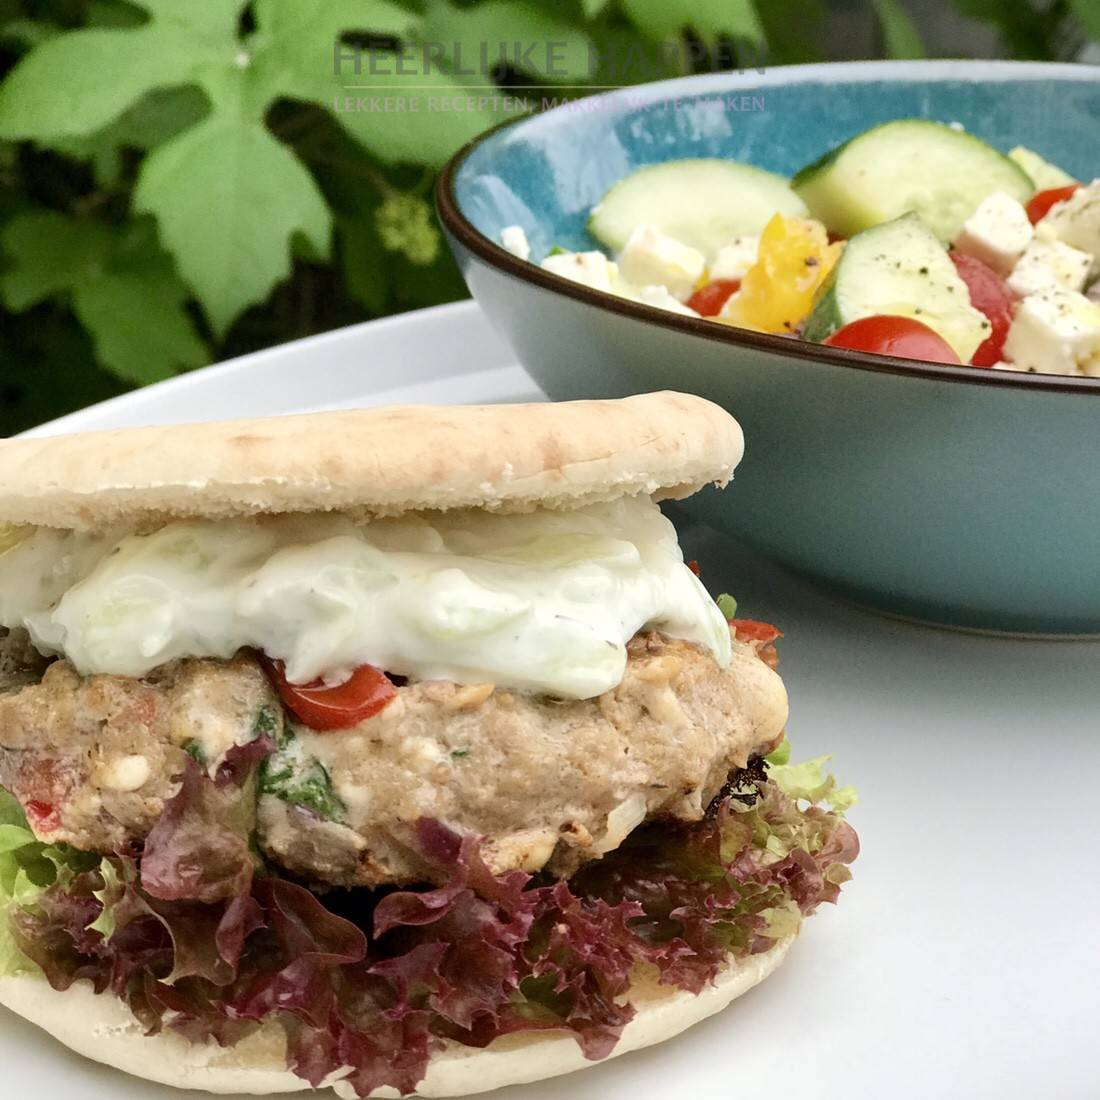 Griekse burger met salade